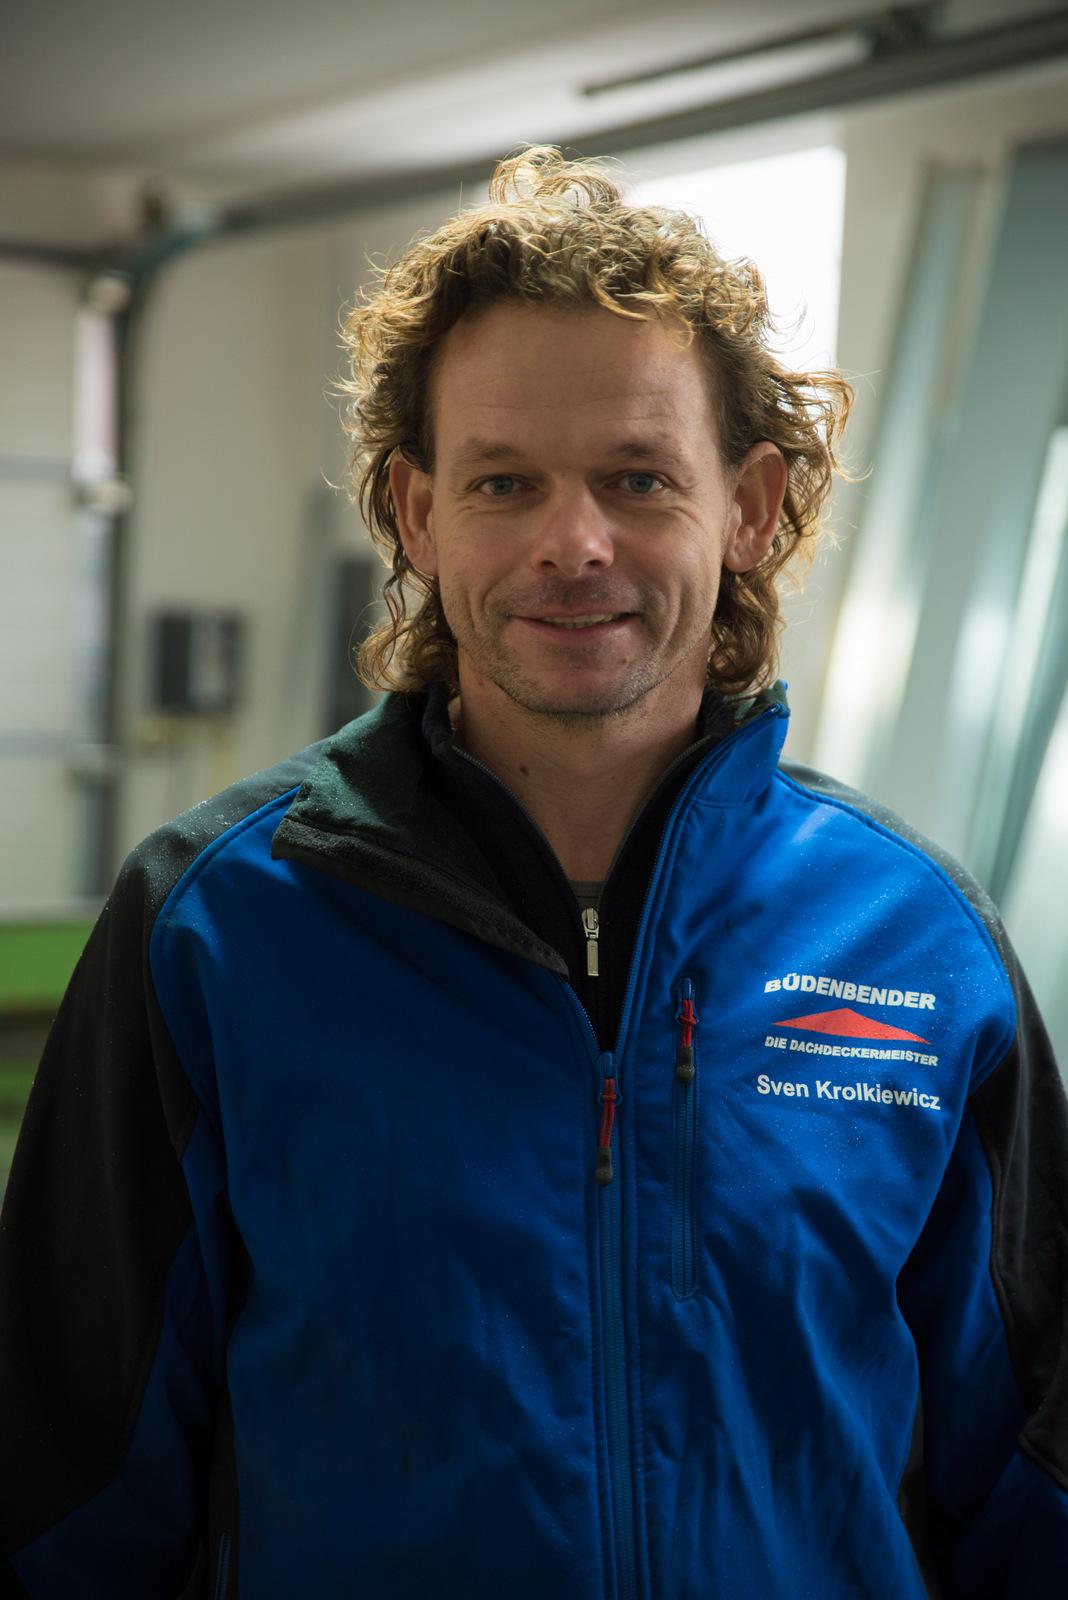 Sven Krolkiewicz